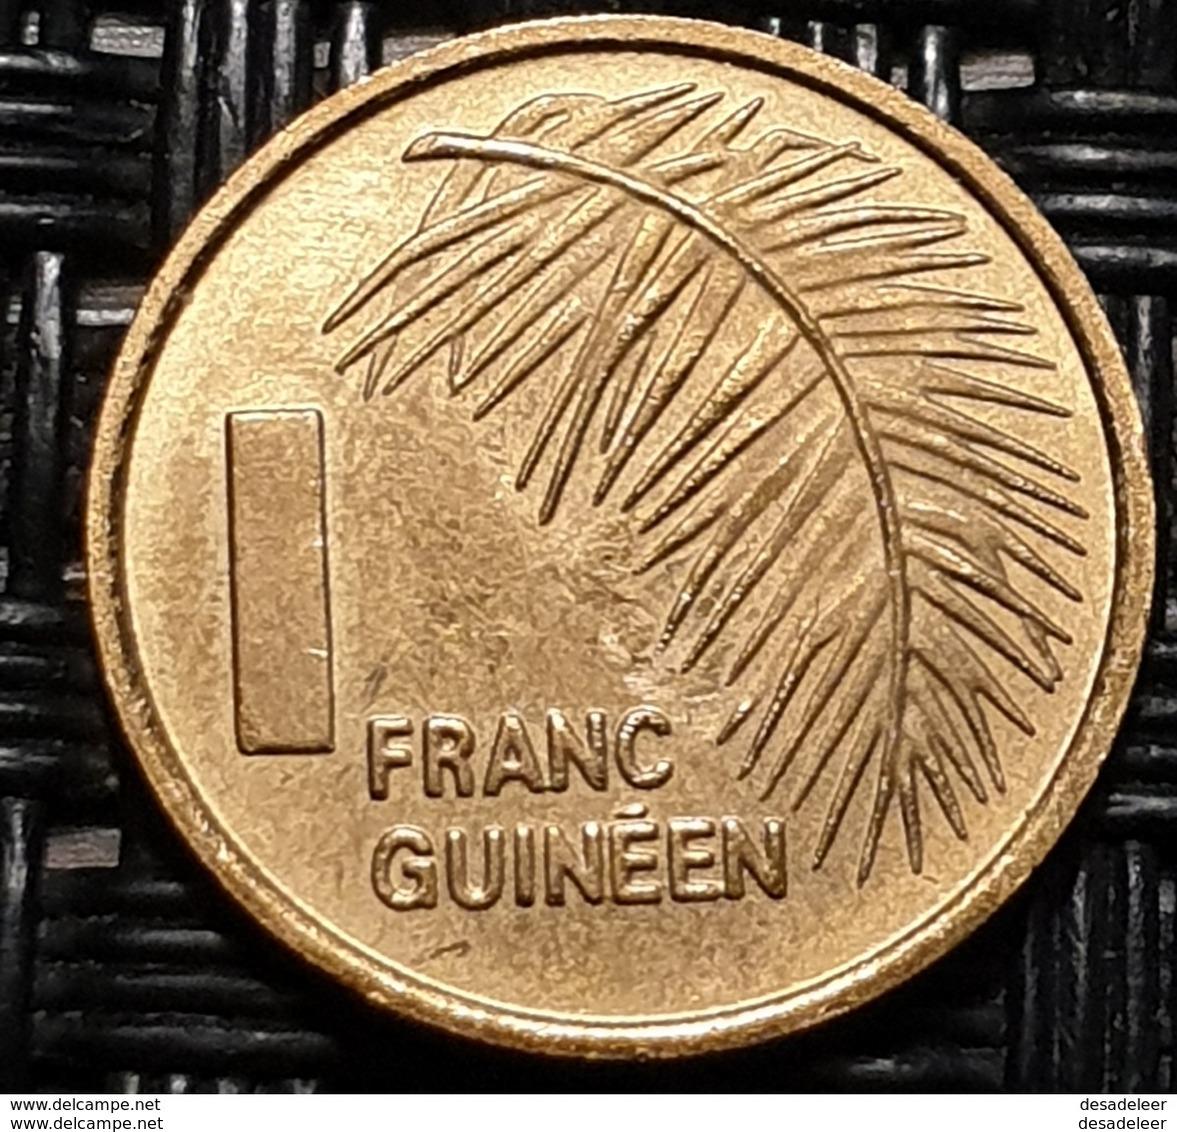 Guinea 1 Franc 1985 - UNC - Guinea